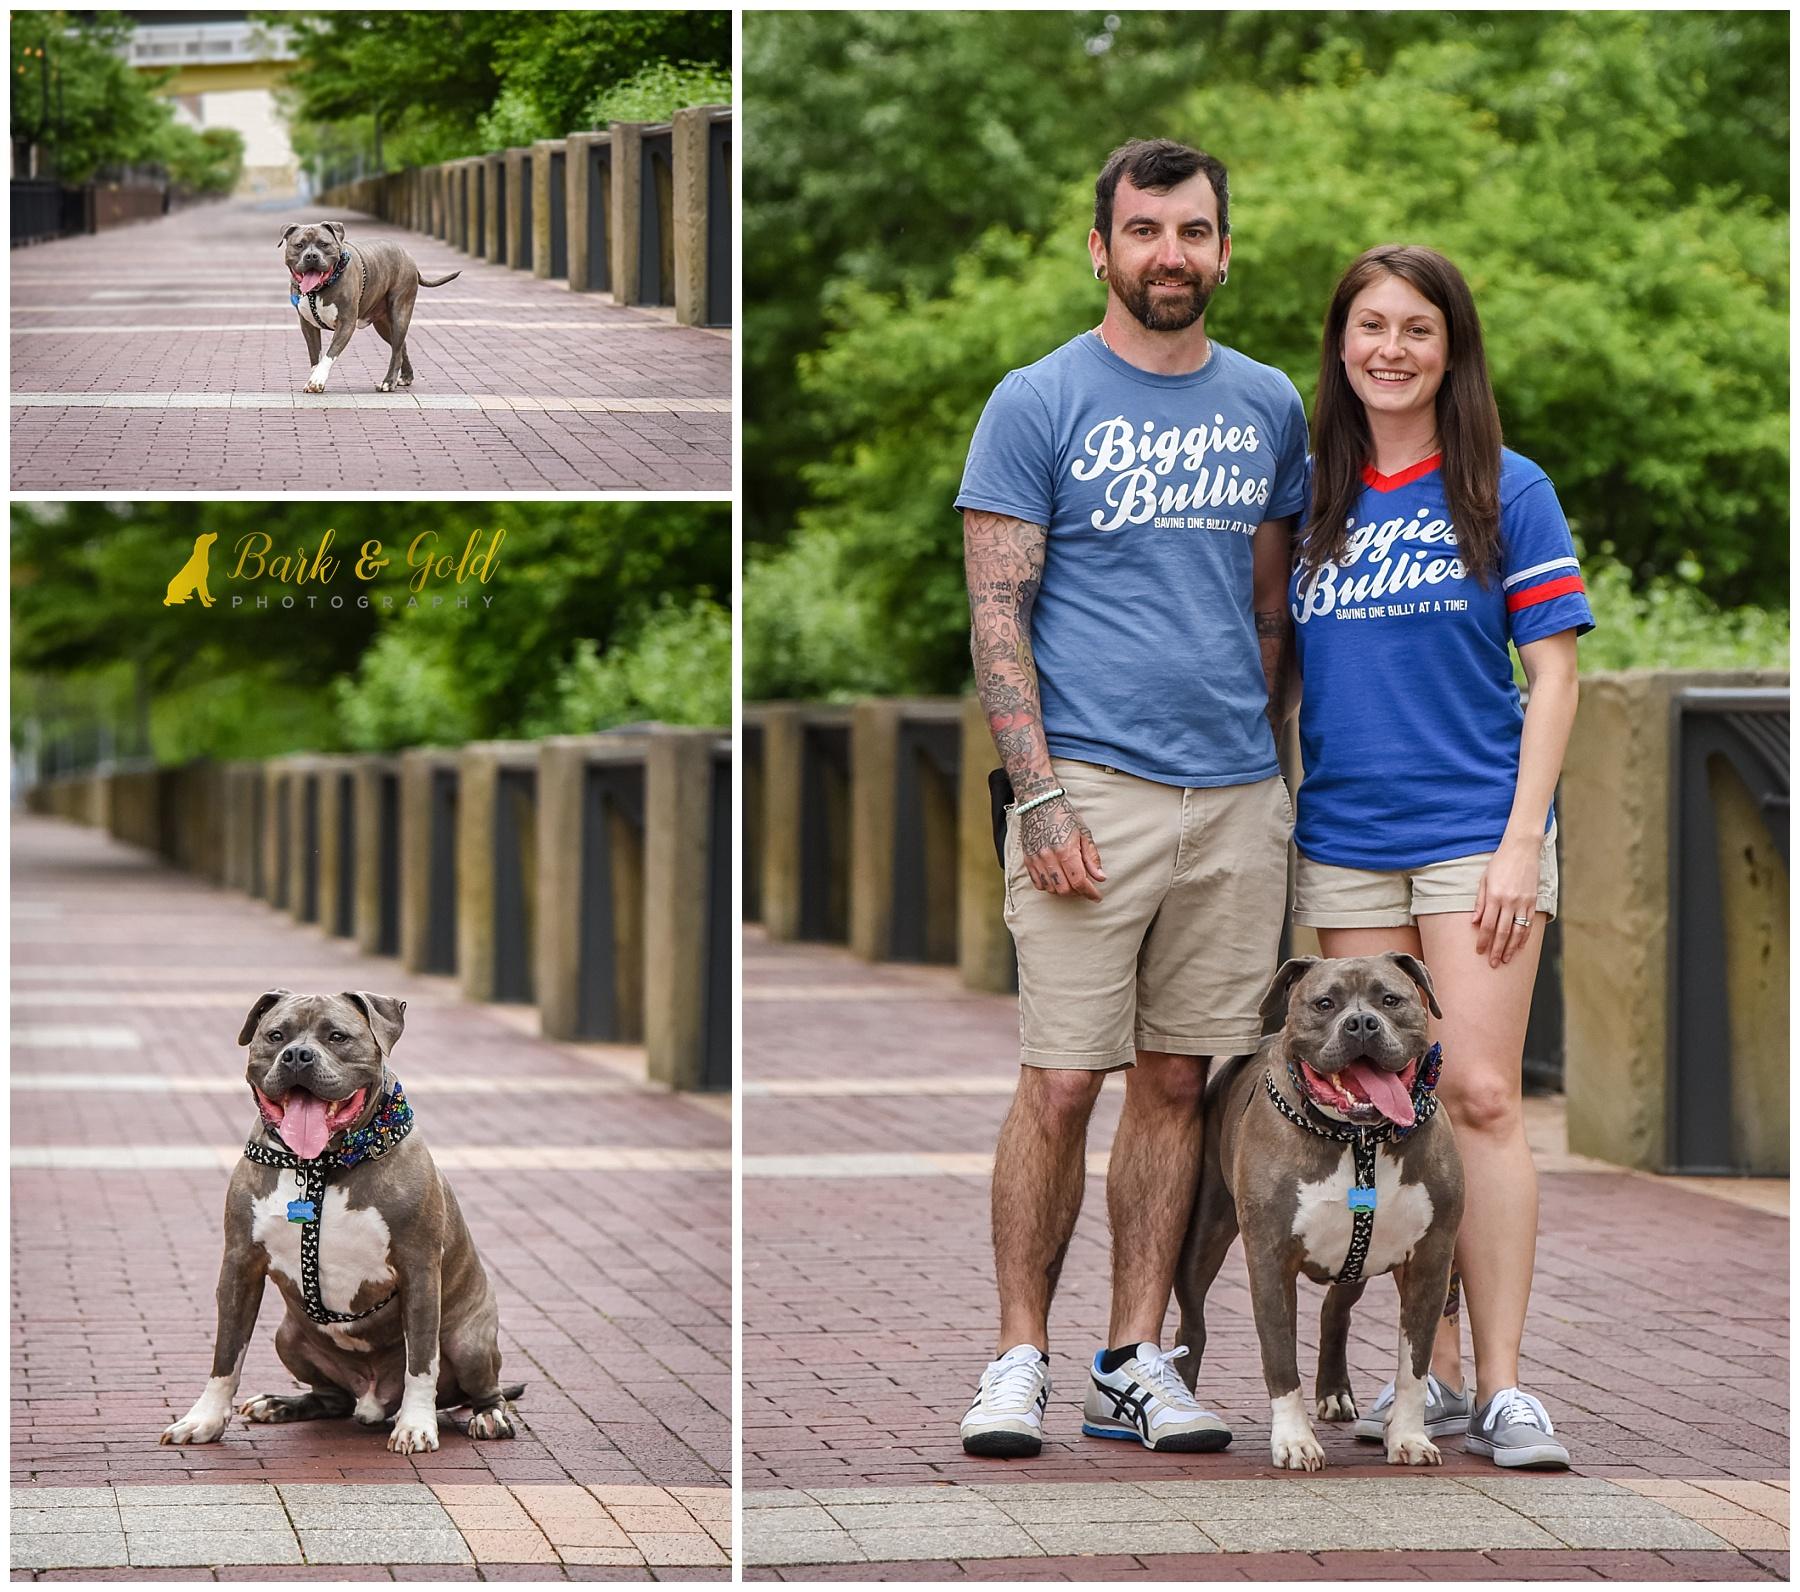 Biggies Bullies pit bull parents on the city's North Shore